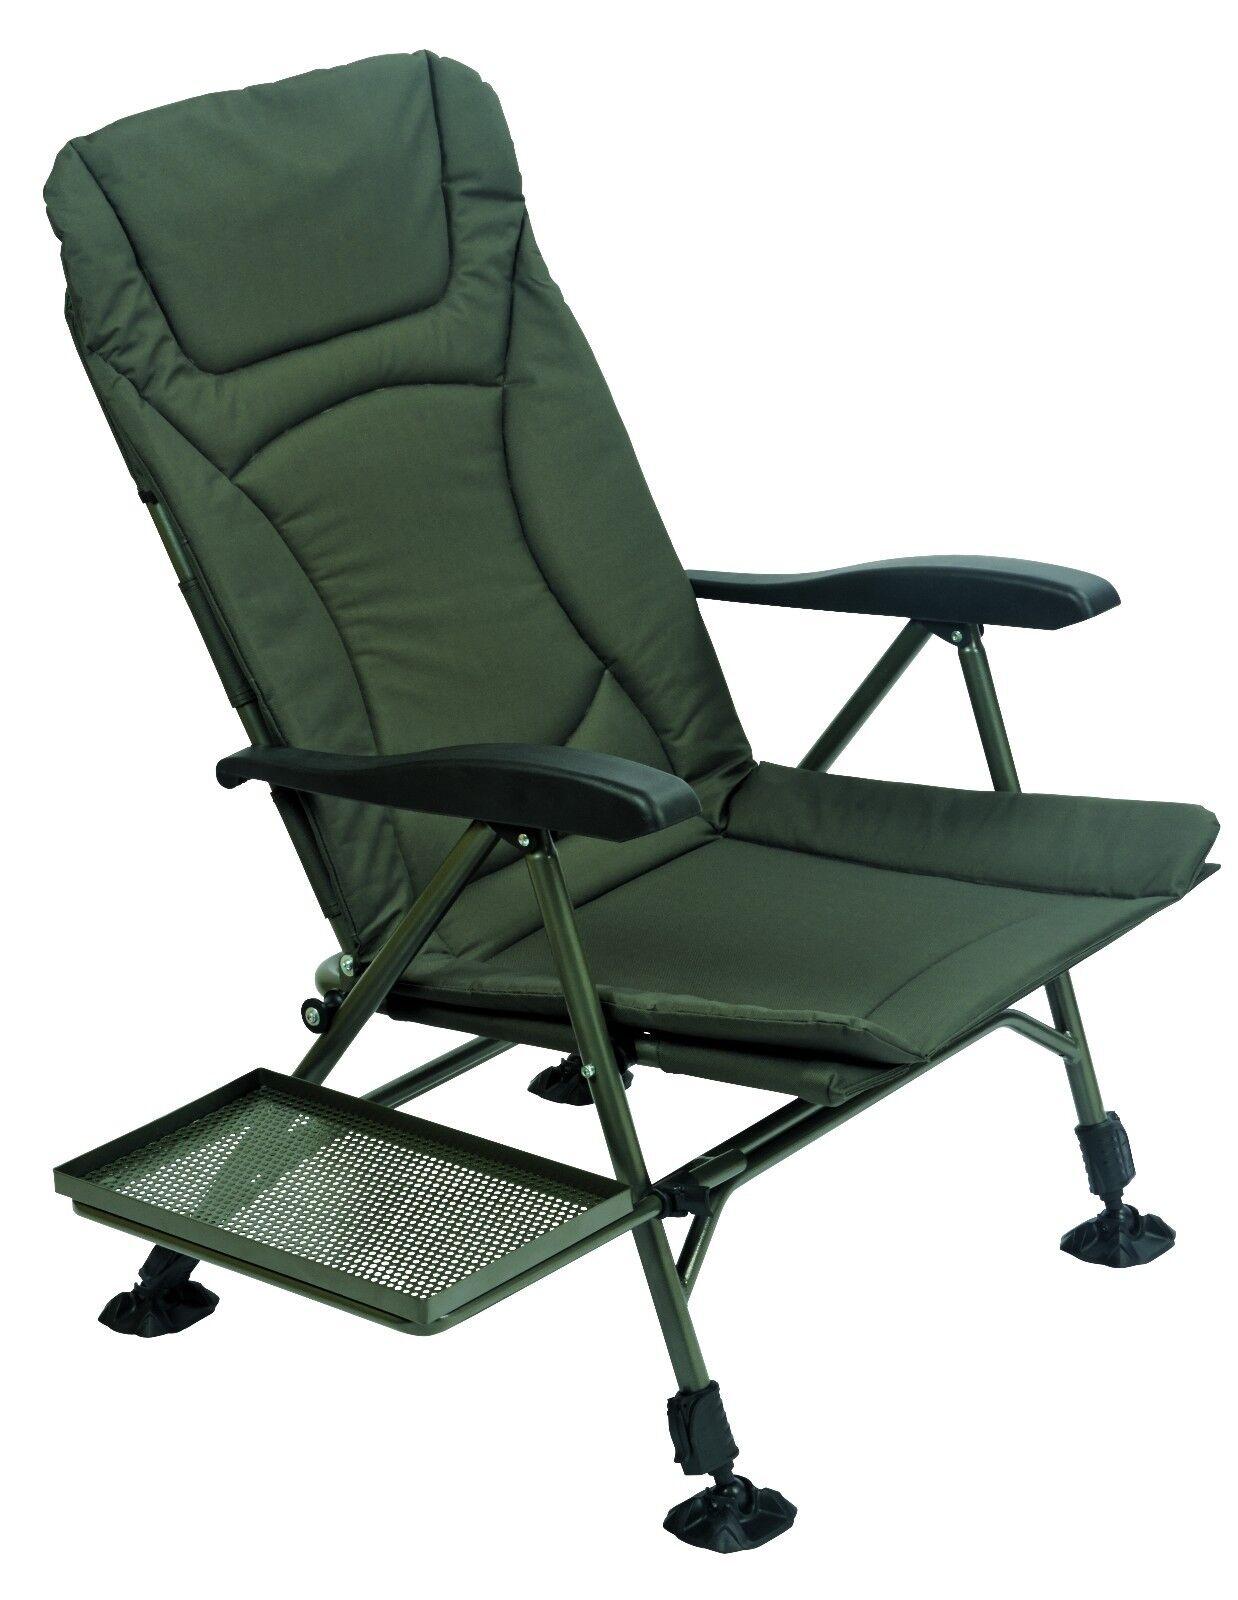 TF Gear NEW Flatout Folding Recliner Carp Fishing Bivvy Arm Chair Ex Demo TFG